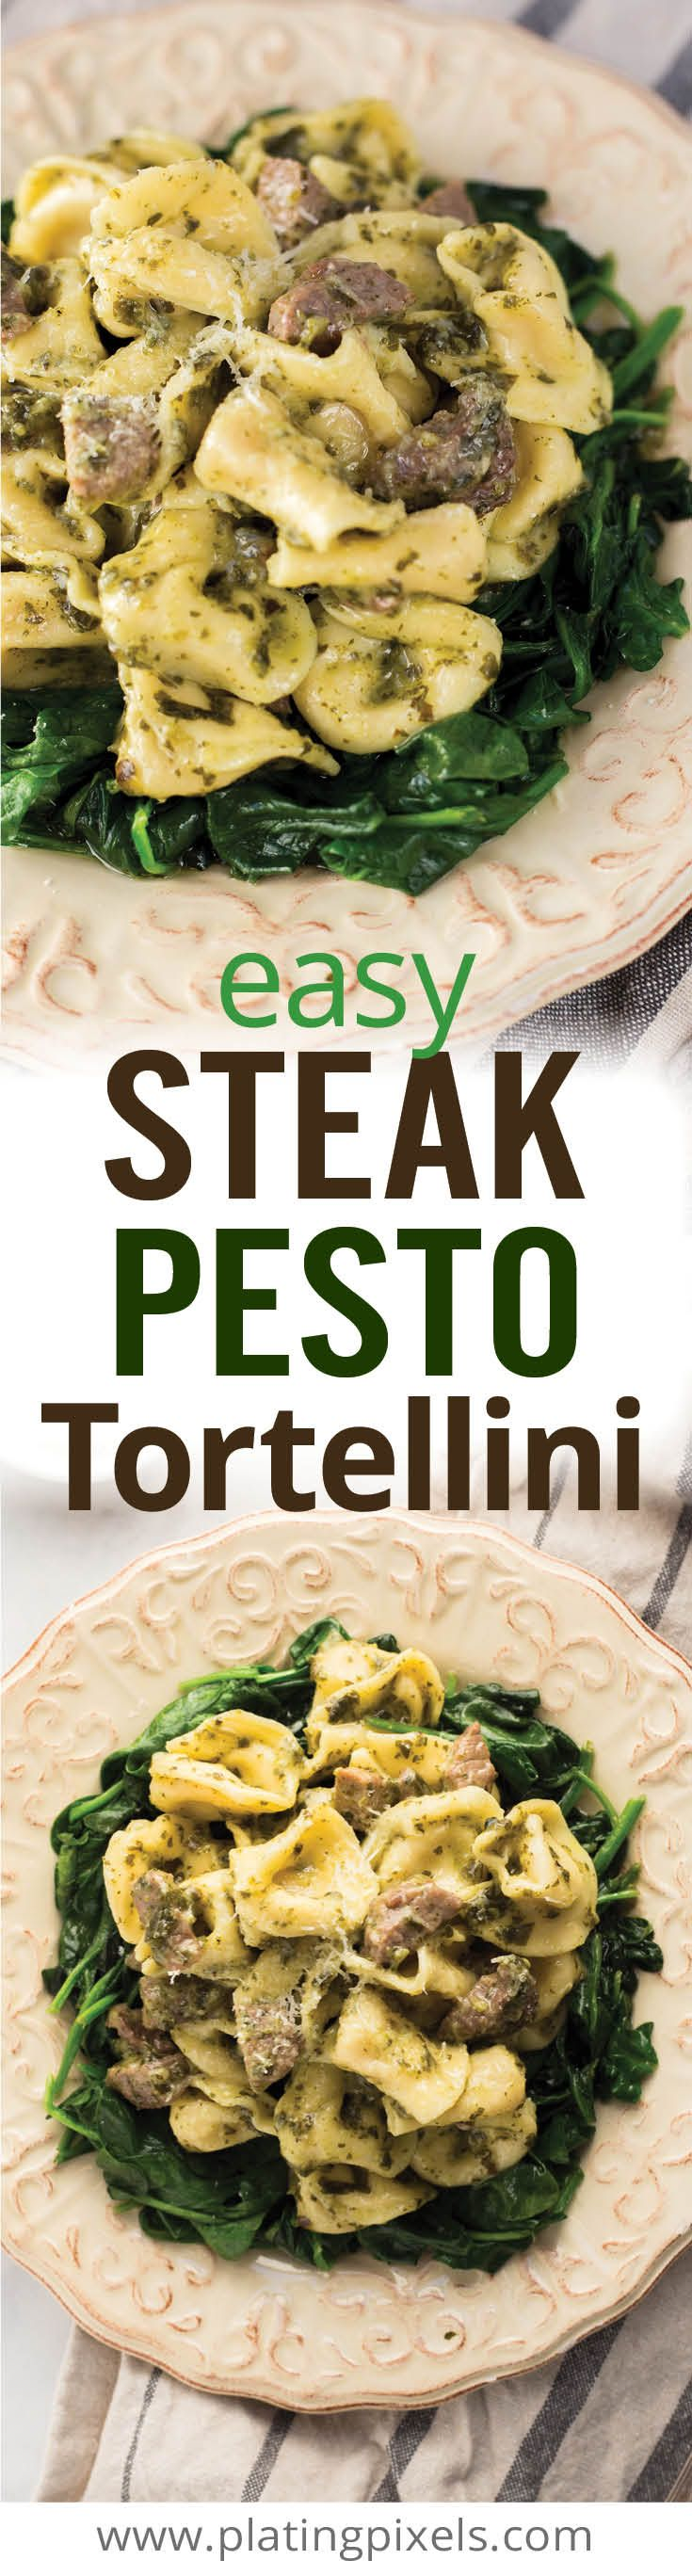 Steak Pesto Tortellini Pasta makes an easy weeknight dinner recipe. Cheese filled tortellini, tender steak, garlic and fresh spinach coated in pesto sauce. A quick recipe in less than 20 minutes. [ad] #Buitoni #CloserToDinner @buitoniusa - www.platingpixels.com